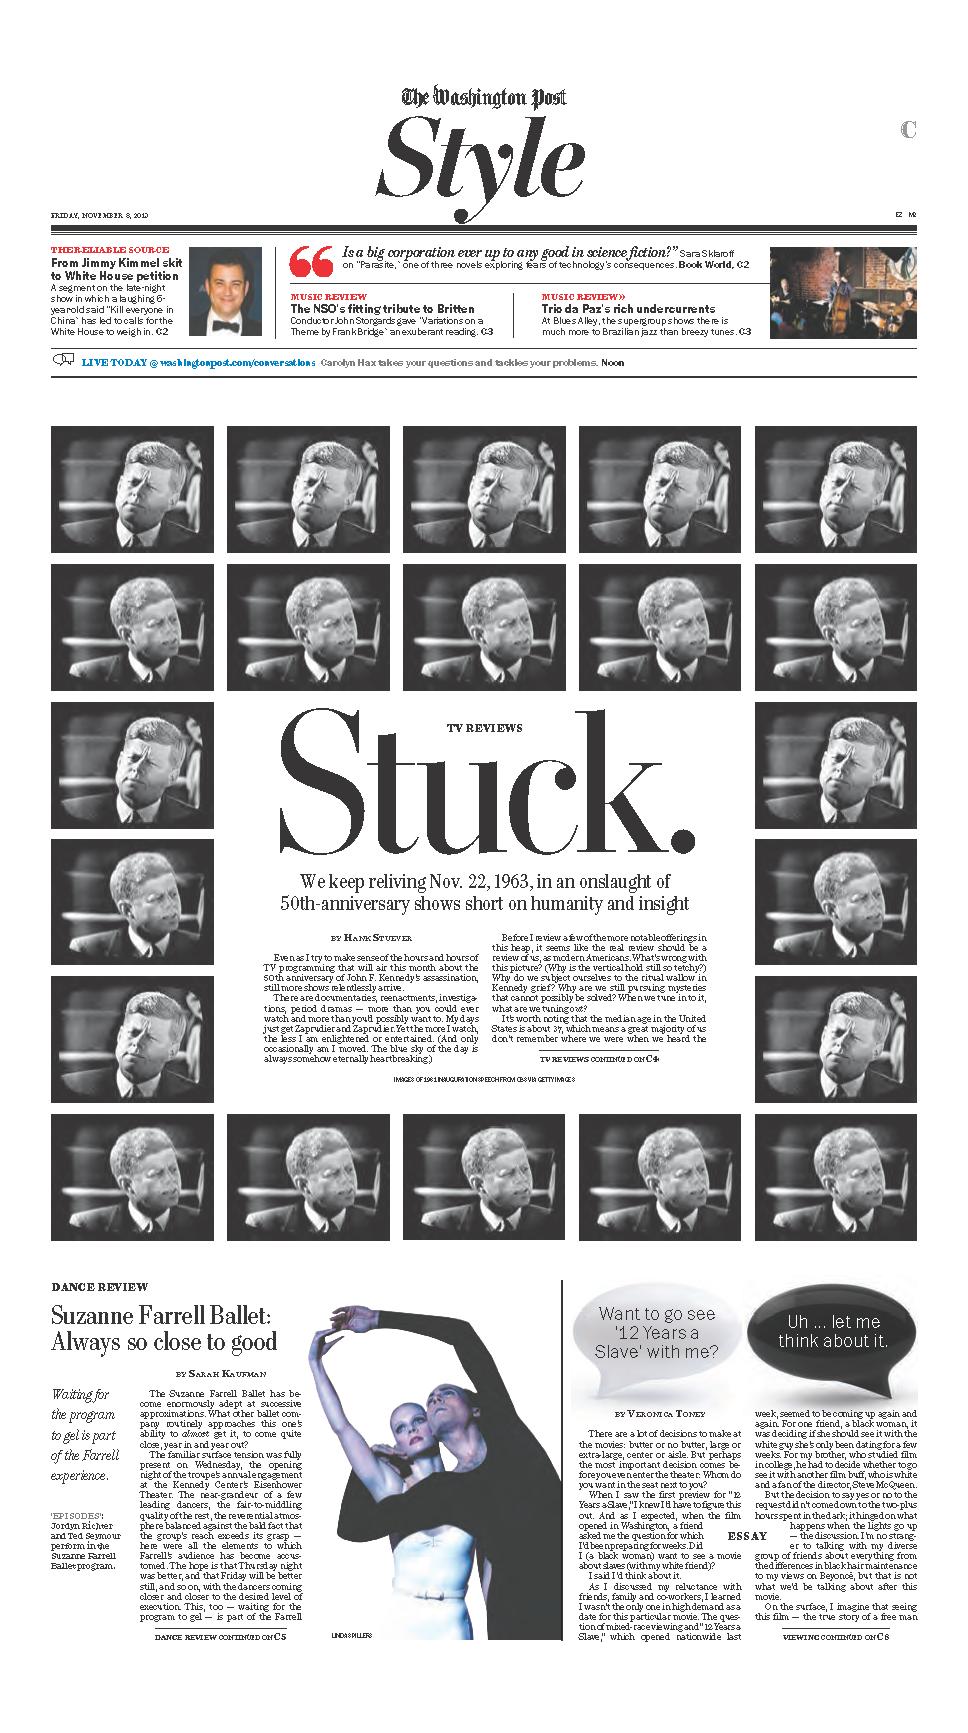 Washington Post Design Newspaper Design Layout Newspaper Design Graphic Design Tips